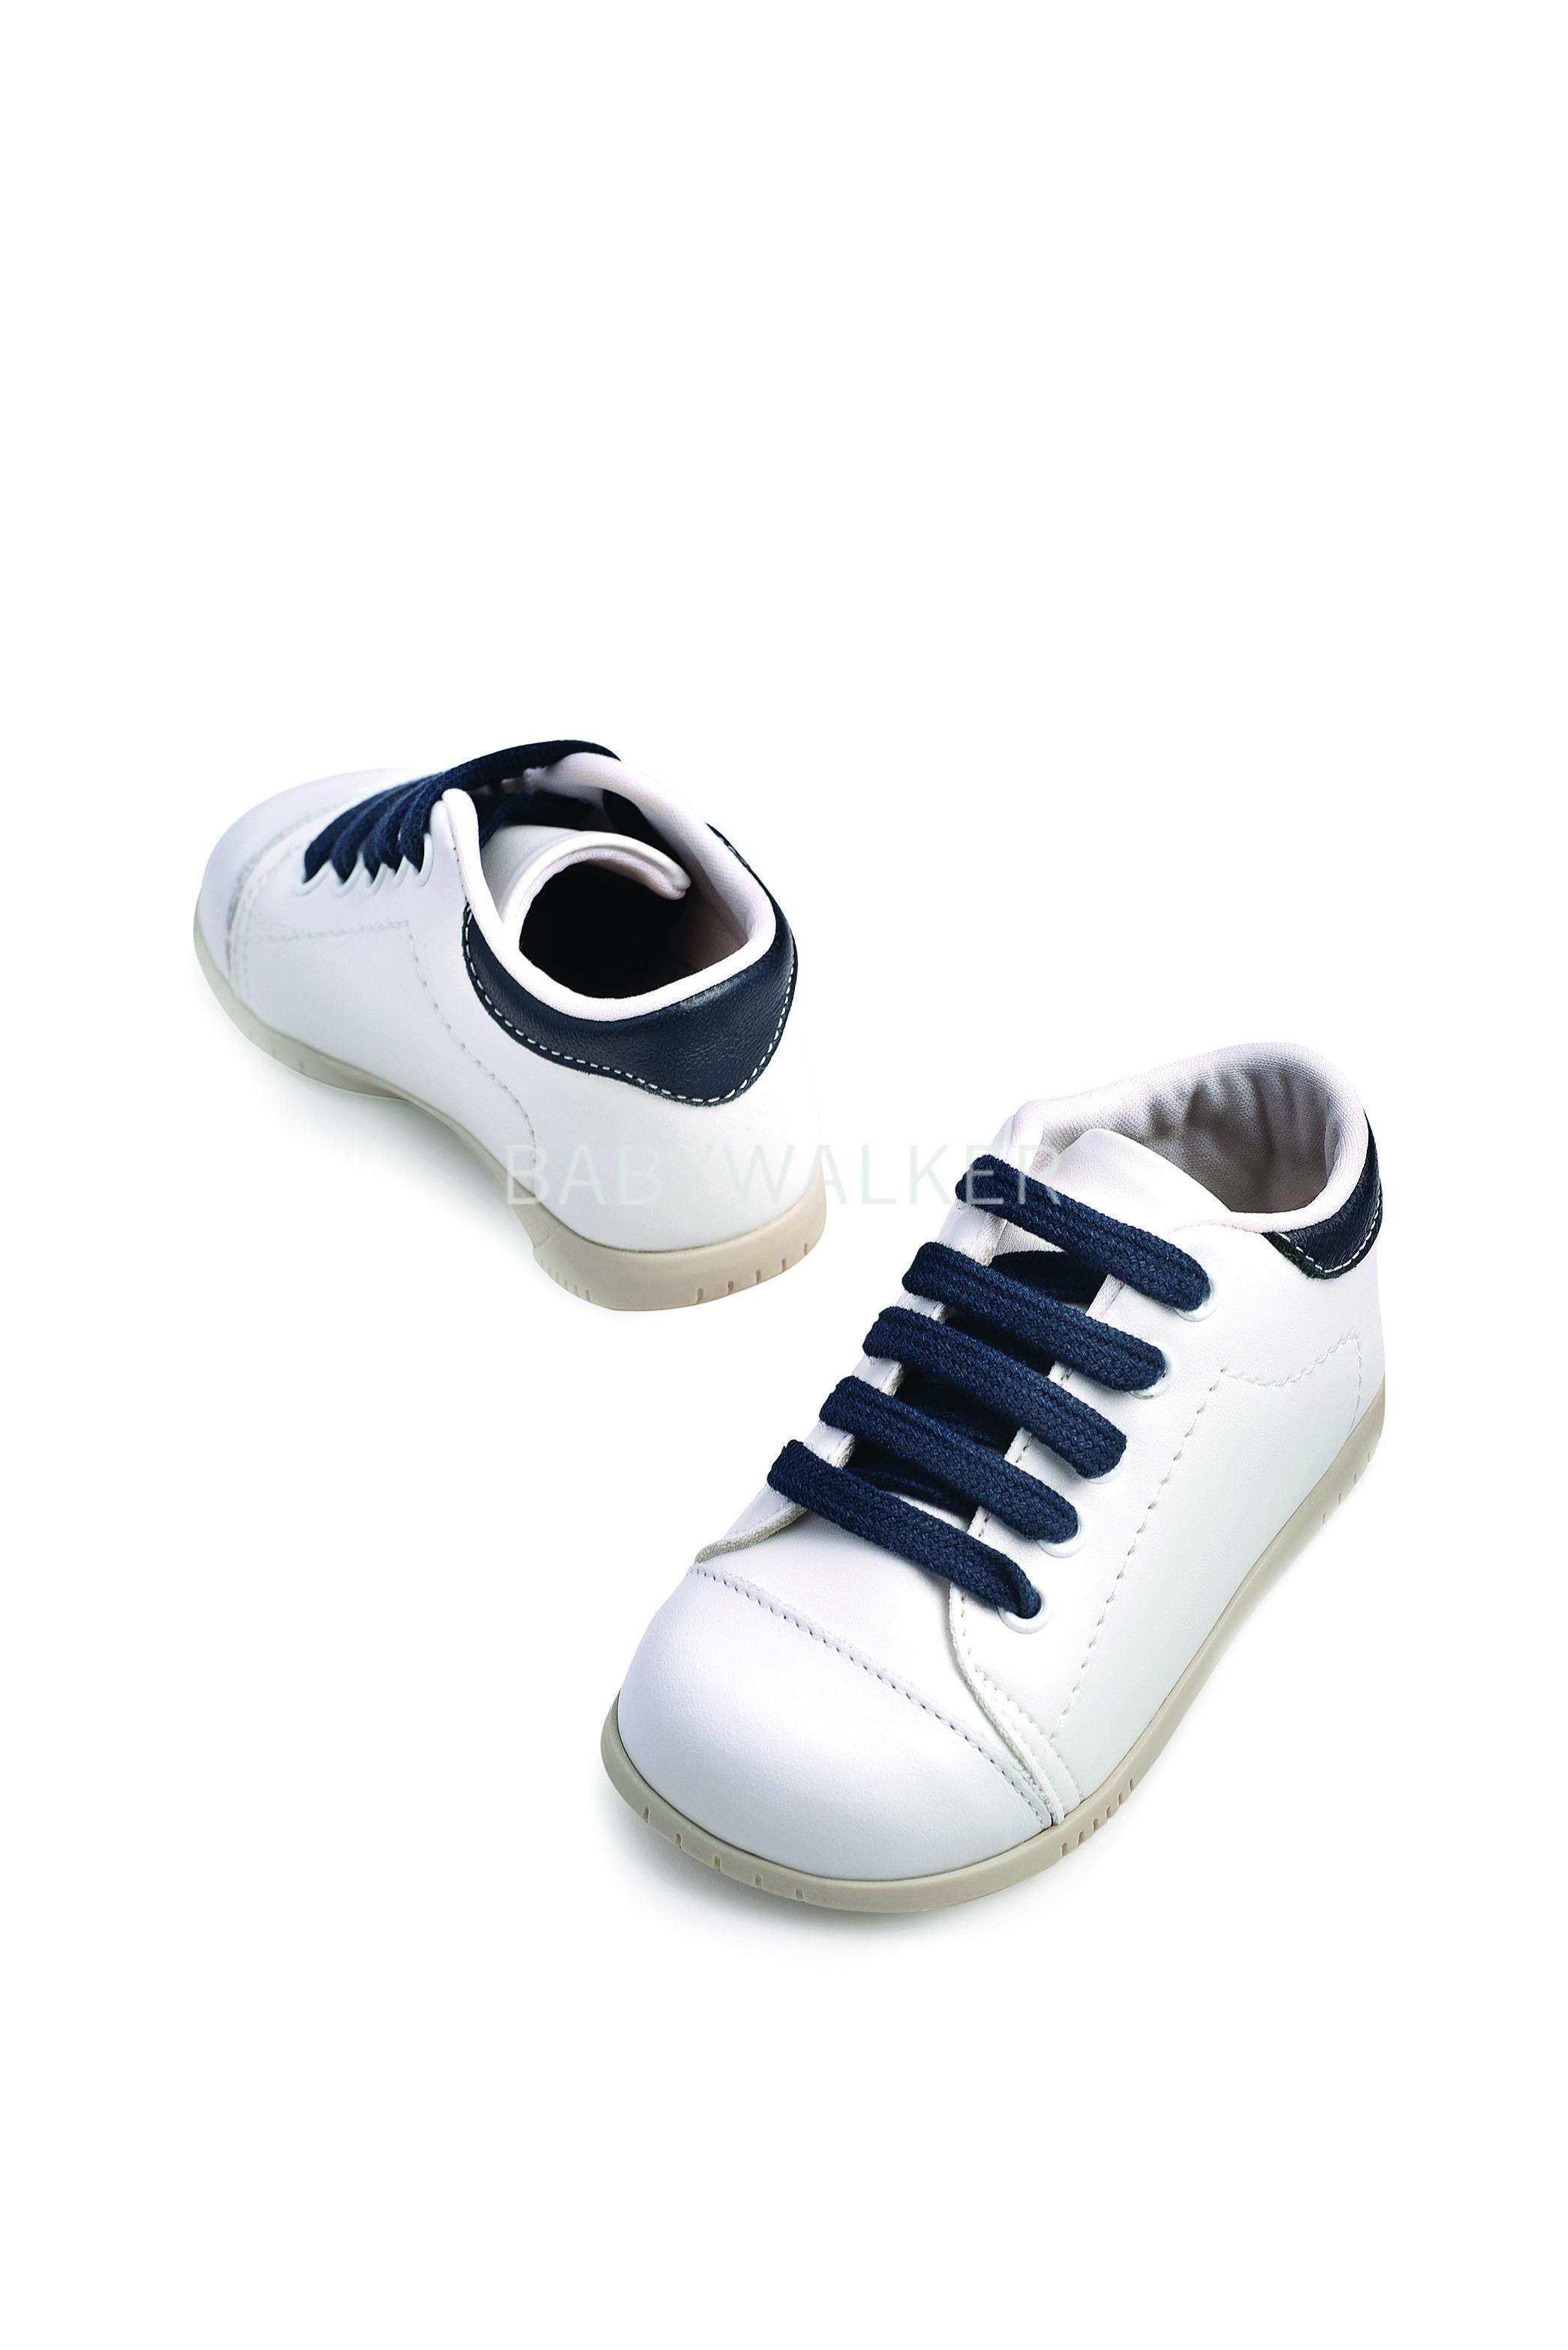 5f15b85c2d1 Βαπτιστικό παπούτσι Babywalker για αγόρι από συνθετικό δέρμα σε λευκό-μπλε.